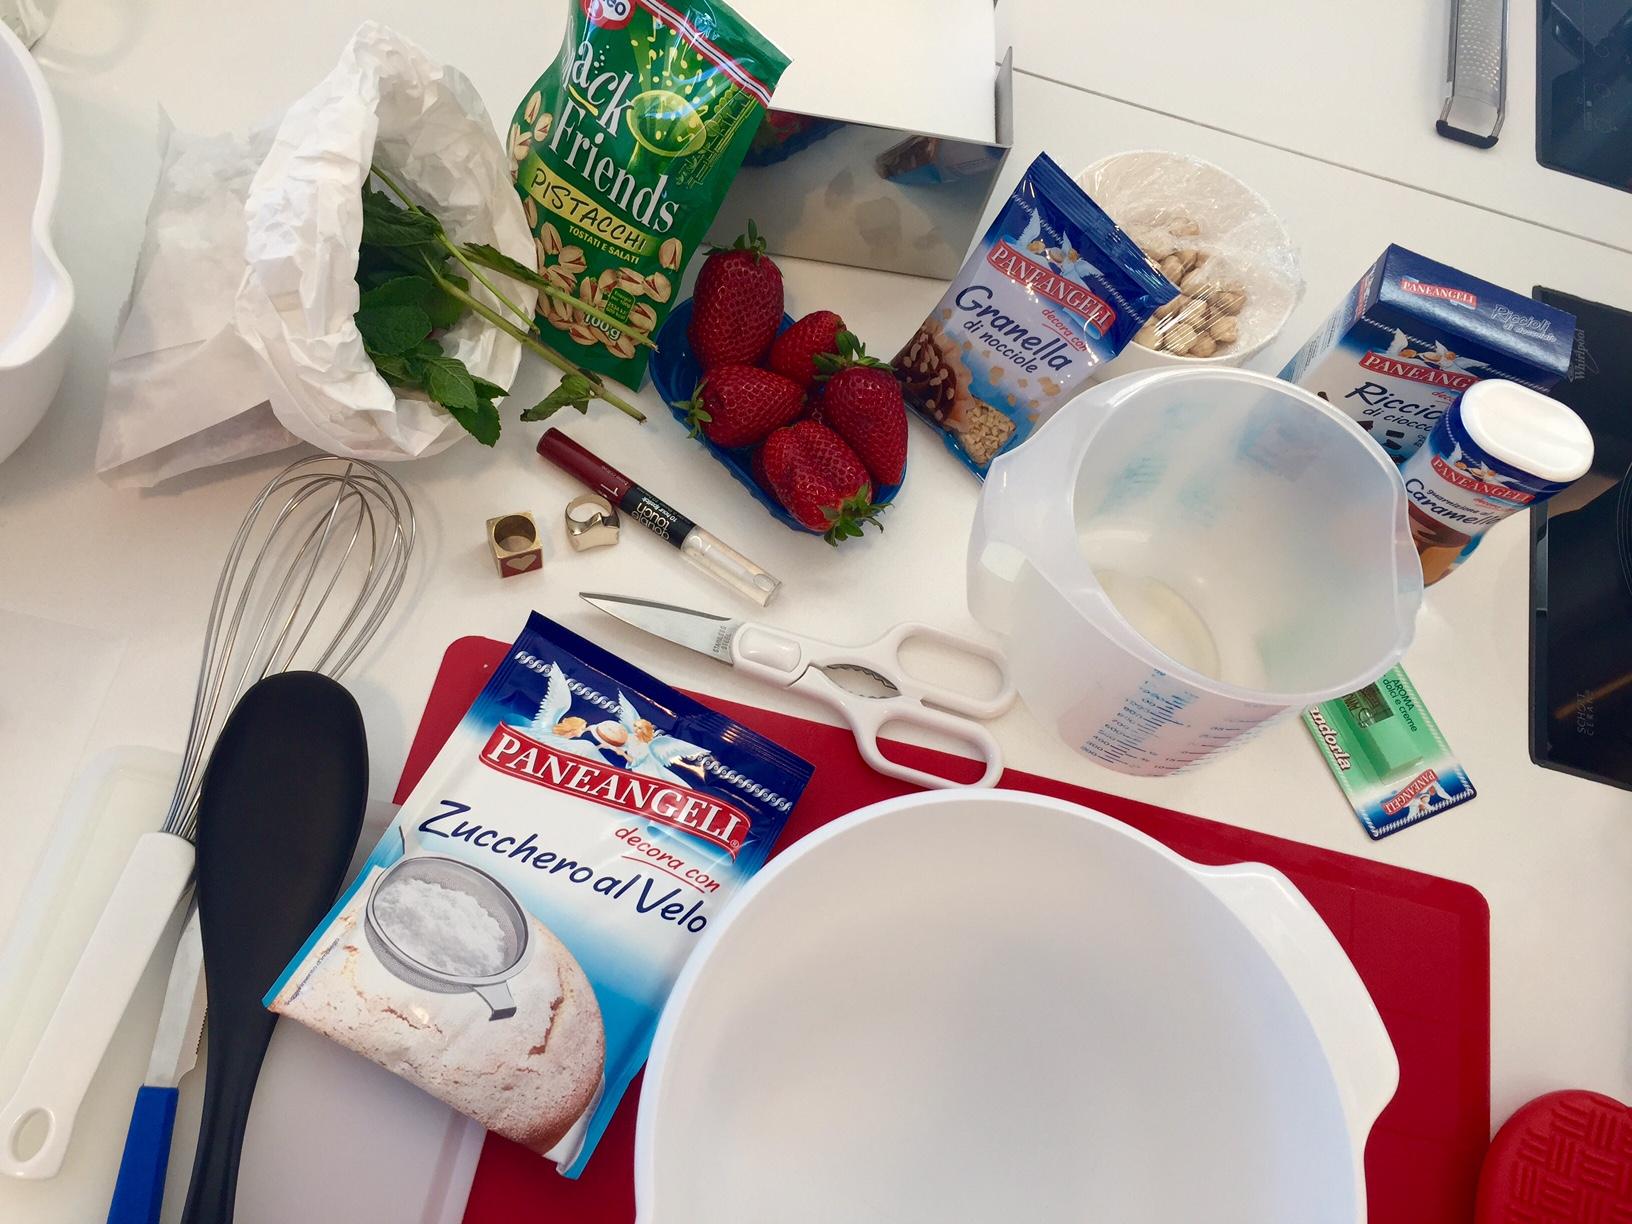 ingredienti-miranda - steve-sex and the city a tavola - budino-cameo-mise-en-place- bon ton-cucina-galateo-cuoco non sid ice piacere bon ton